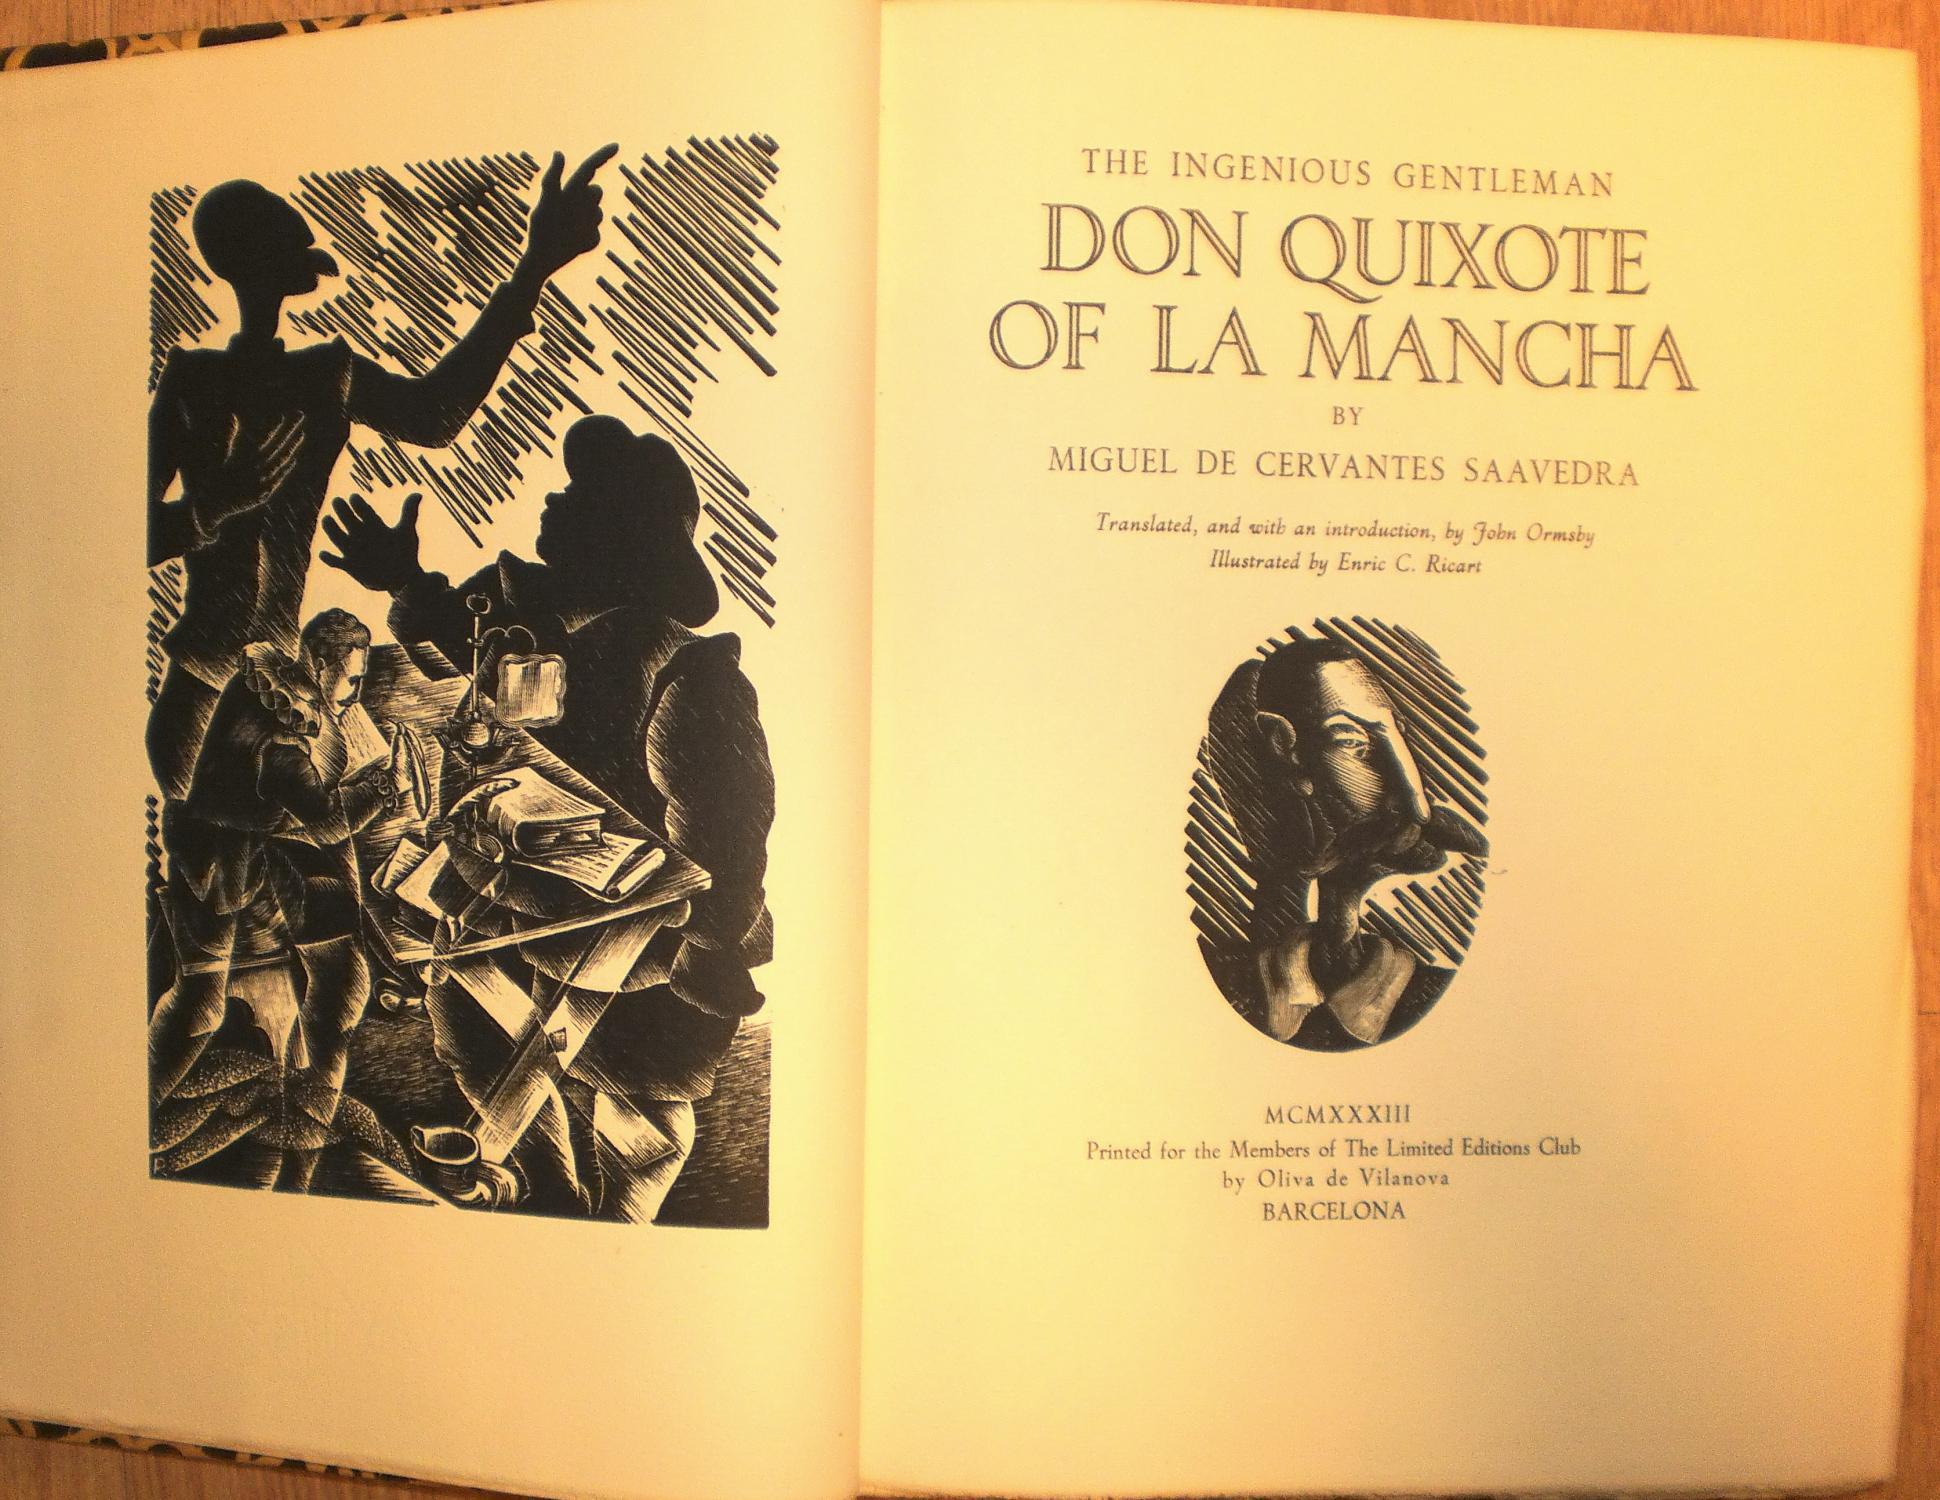 an analysis of the novel don quixote de la mancha by miguel de cervantes Download don quixote audiobook (rate this audio book) author: miguel de cervantes narrator: the adventures of don quixote de la mancha.